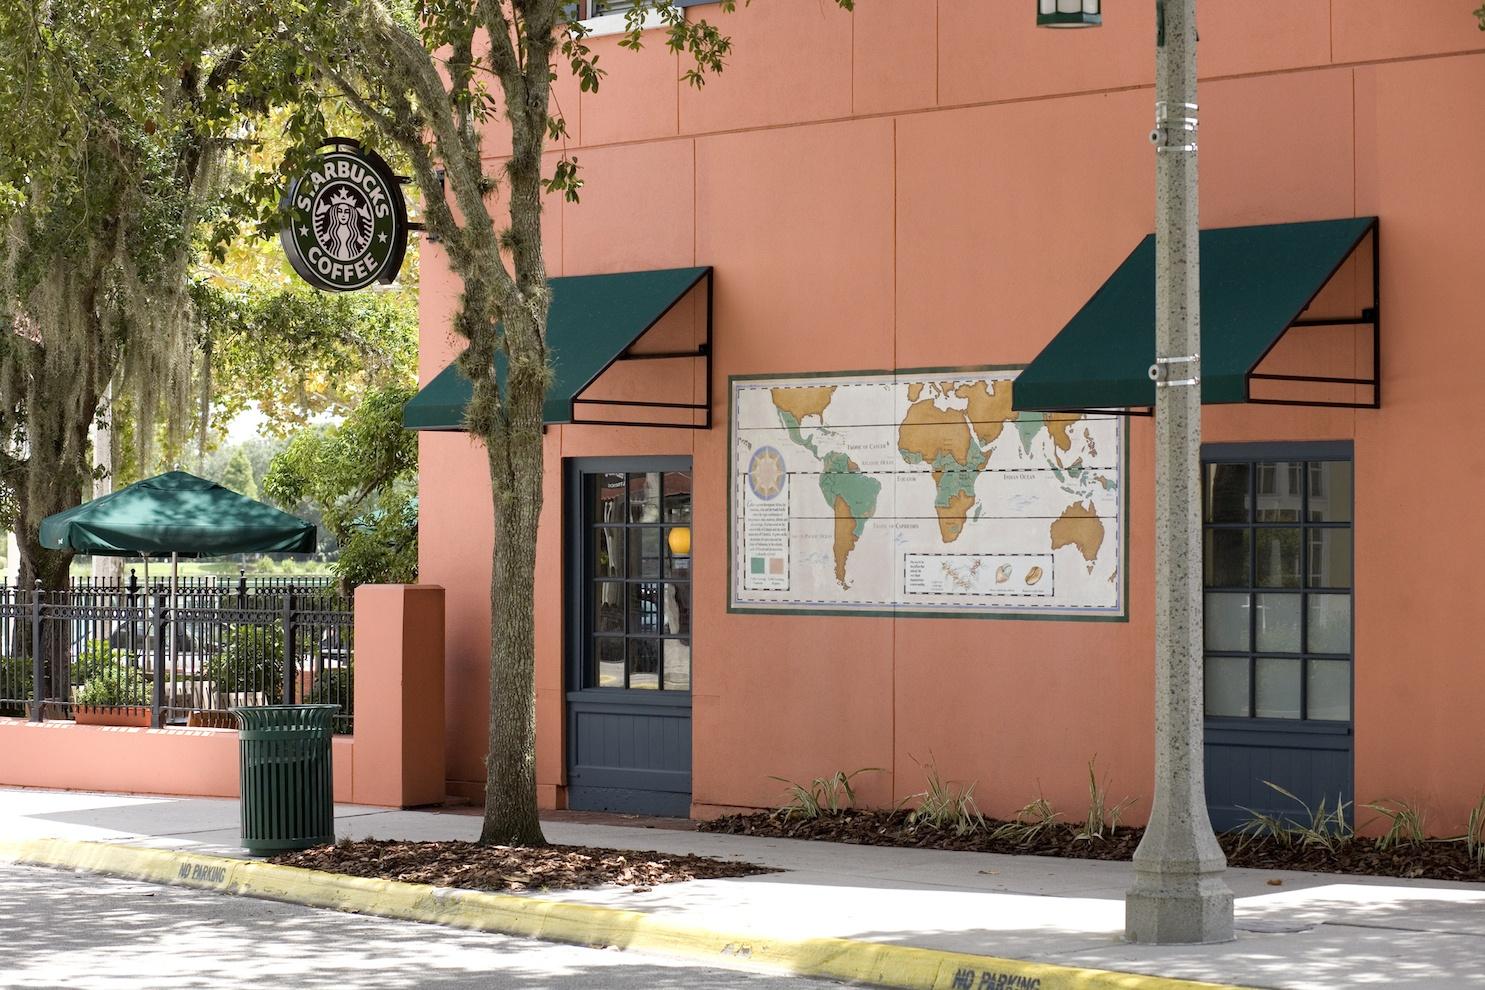 Starbucks Coffee in Celebration Florida